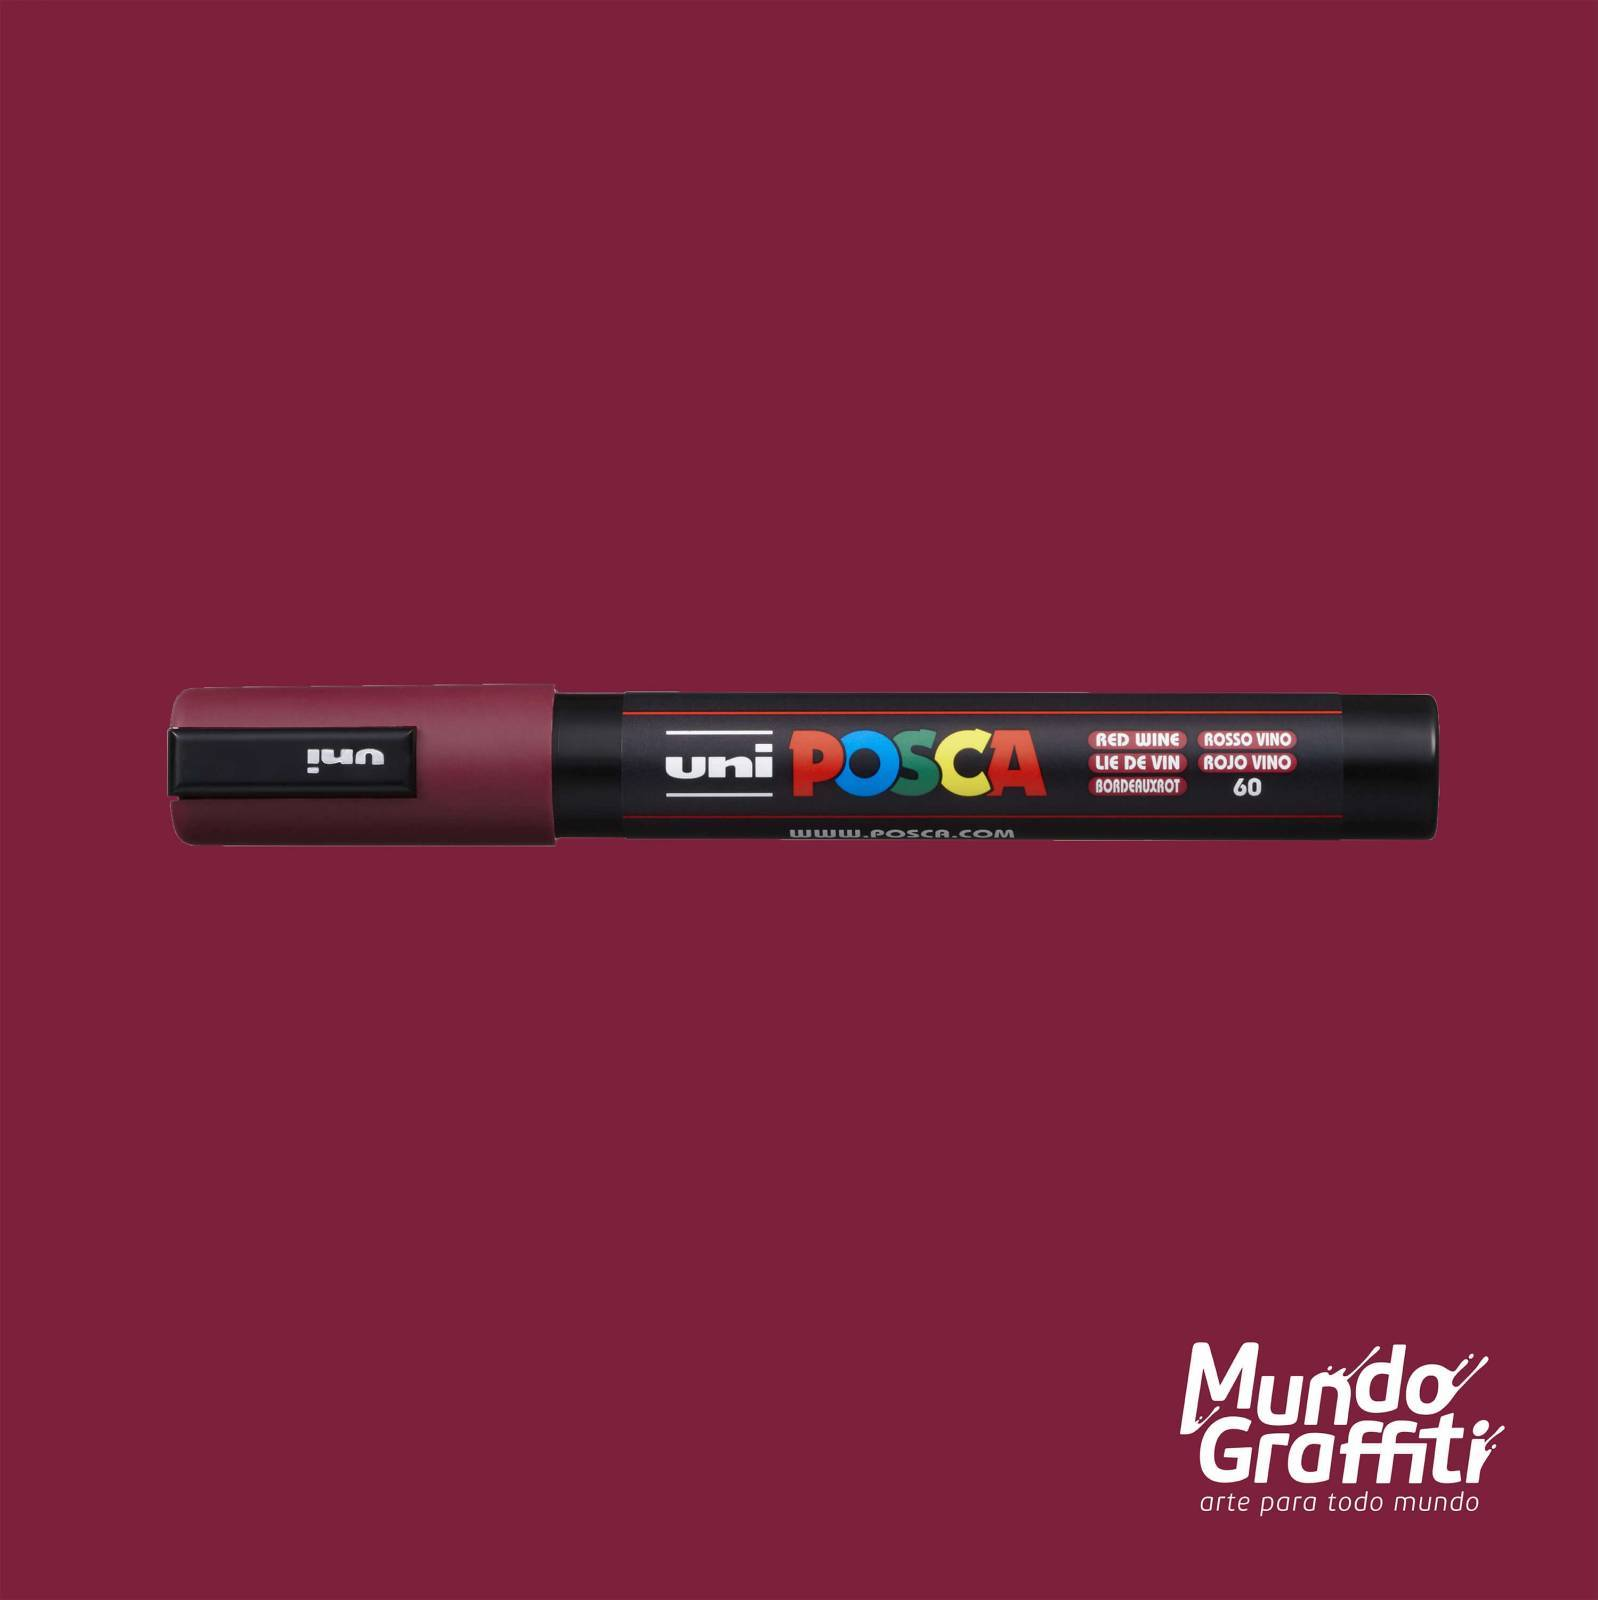 Caneta Posca 5M Vinho - Mundo Graffiti